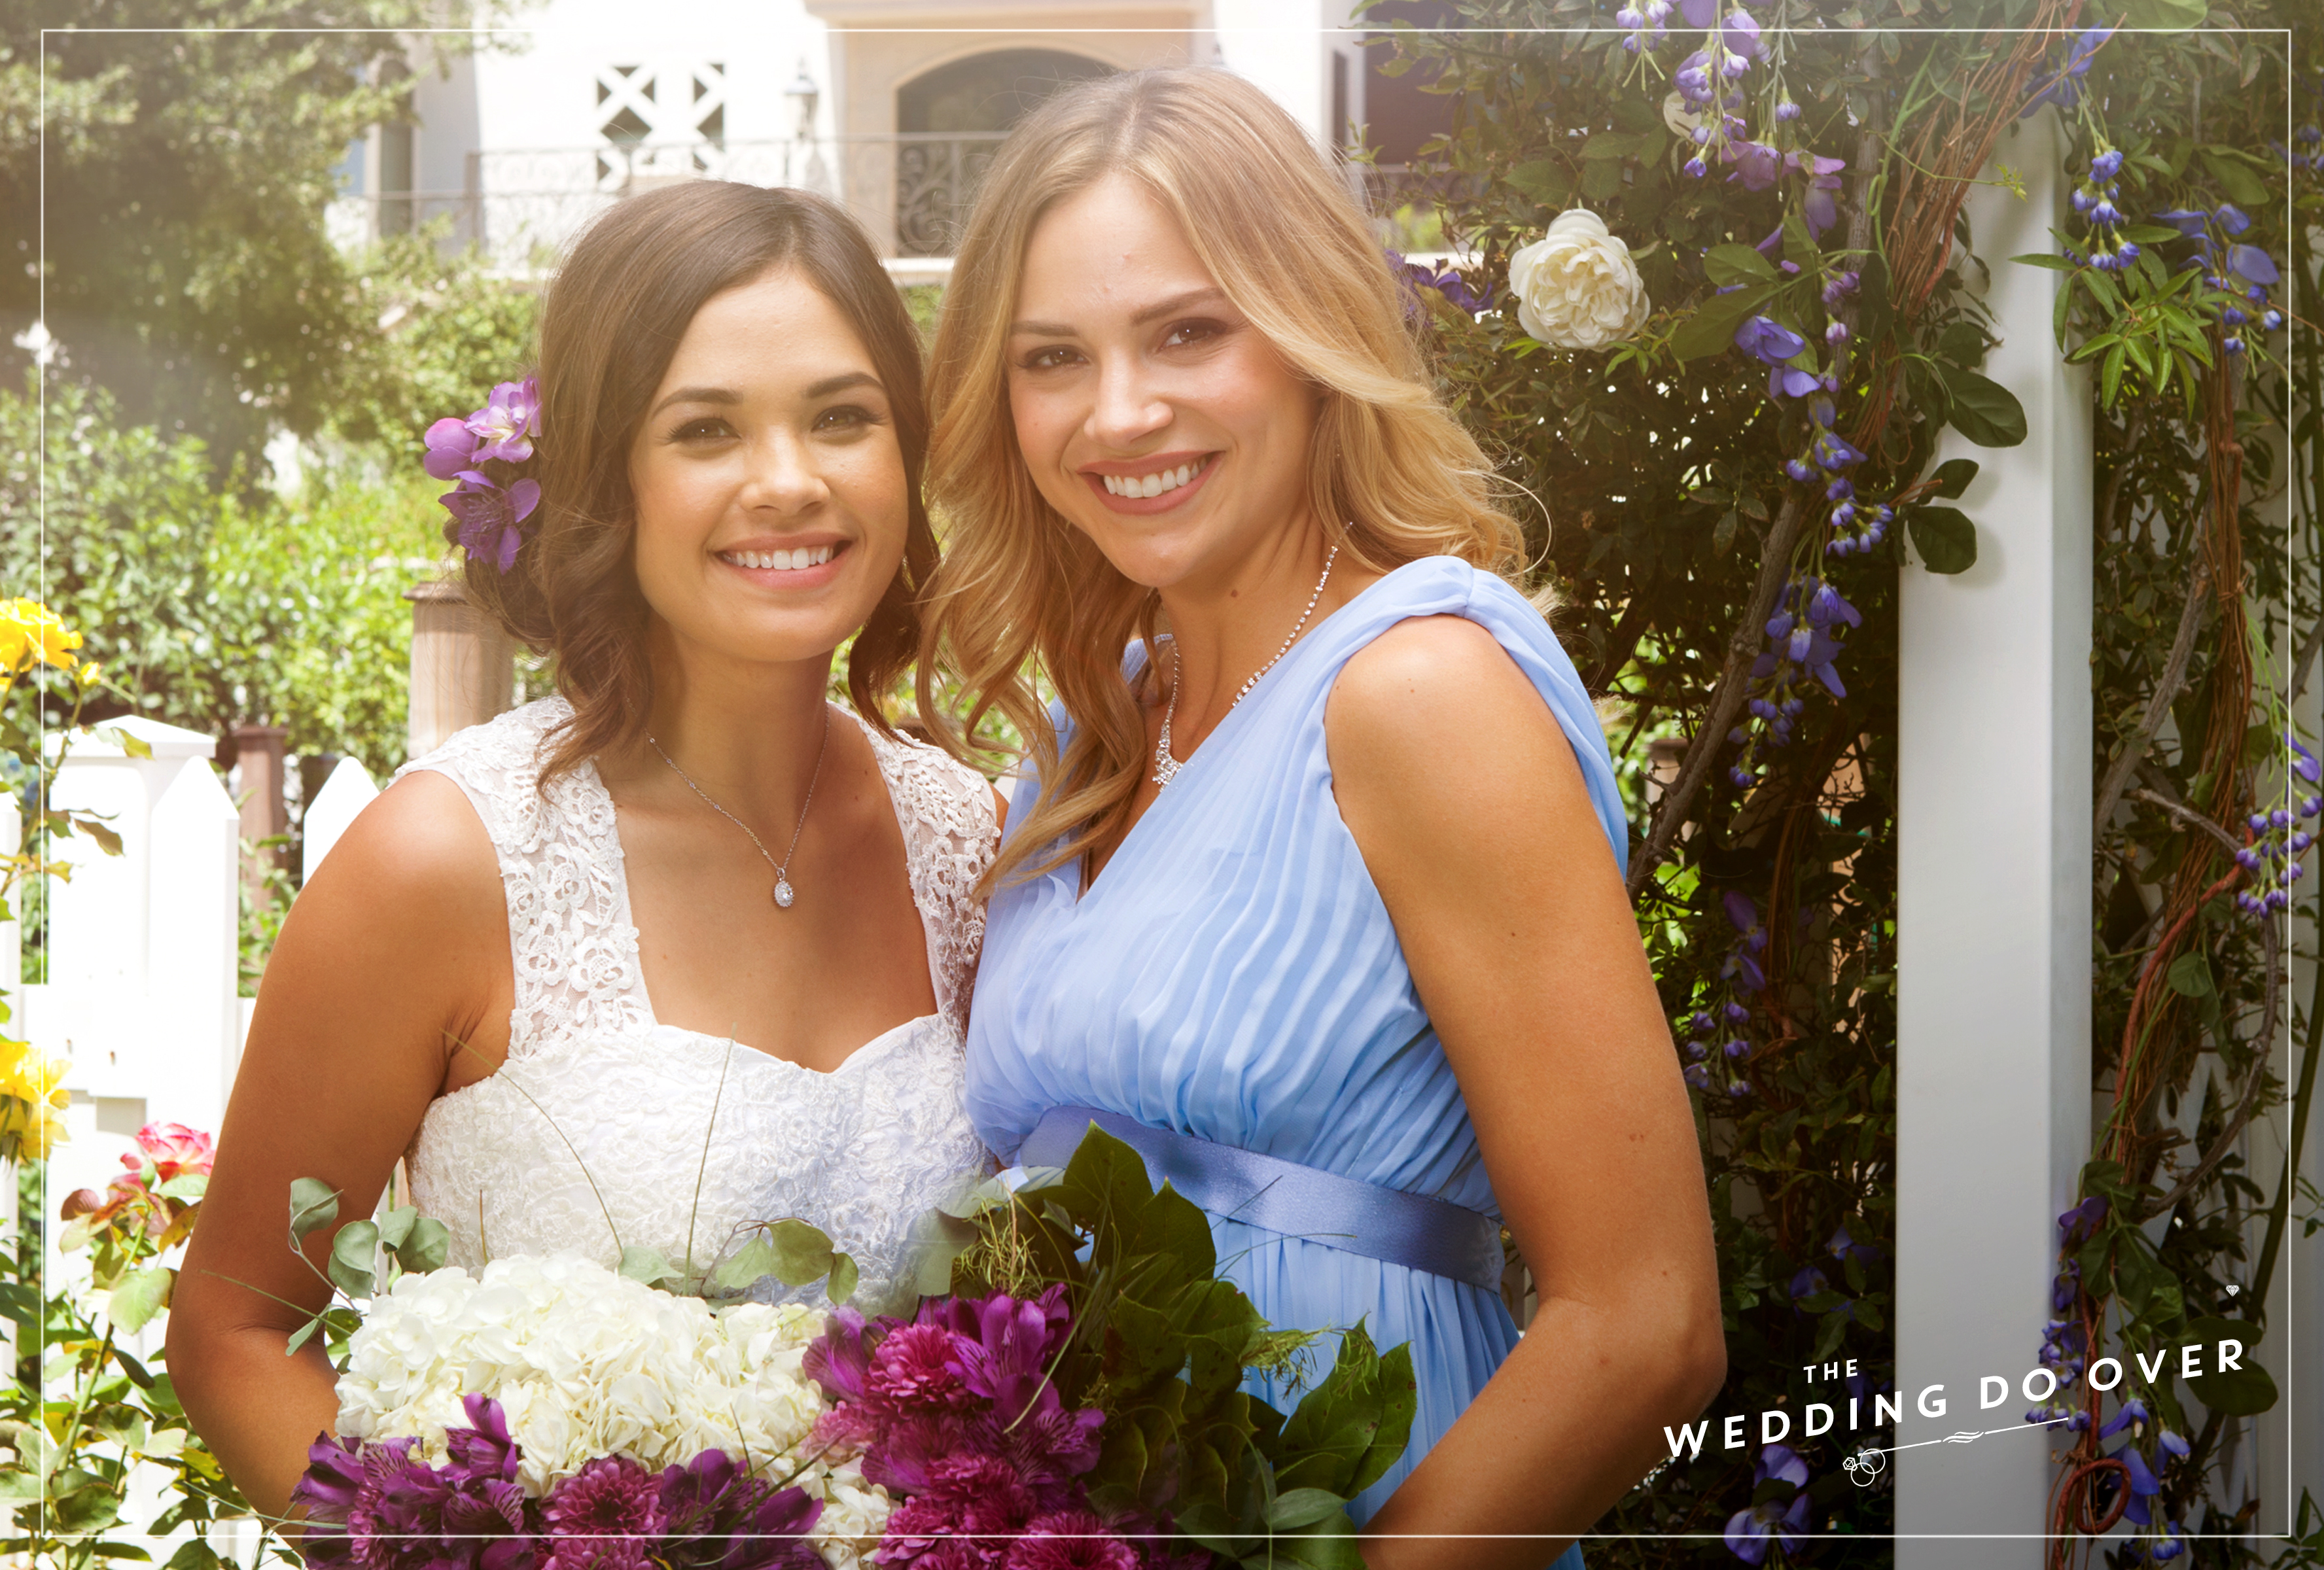 The Wedding Do Over Tv Movie 2018 Images Imdb